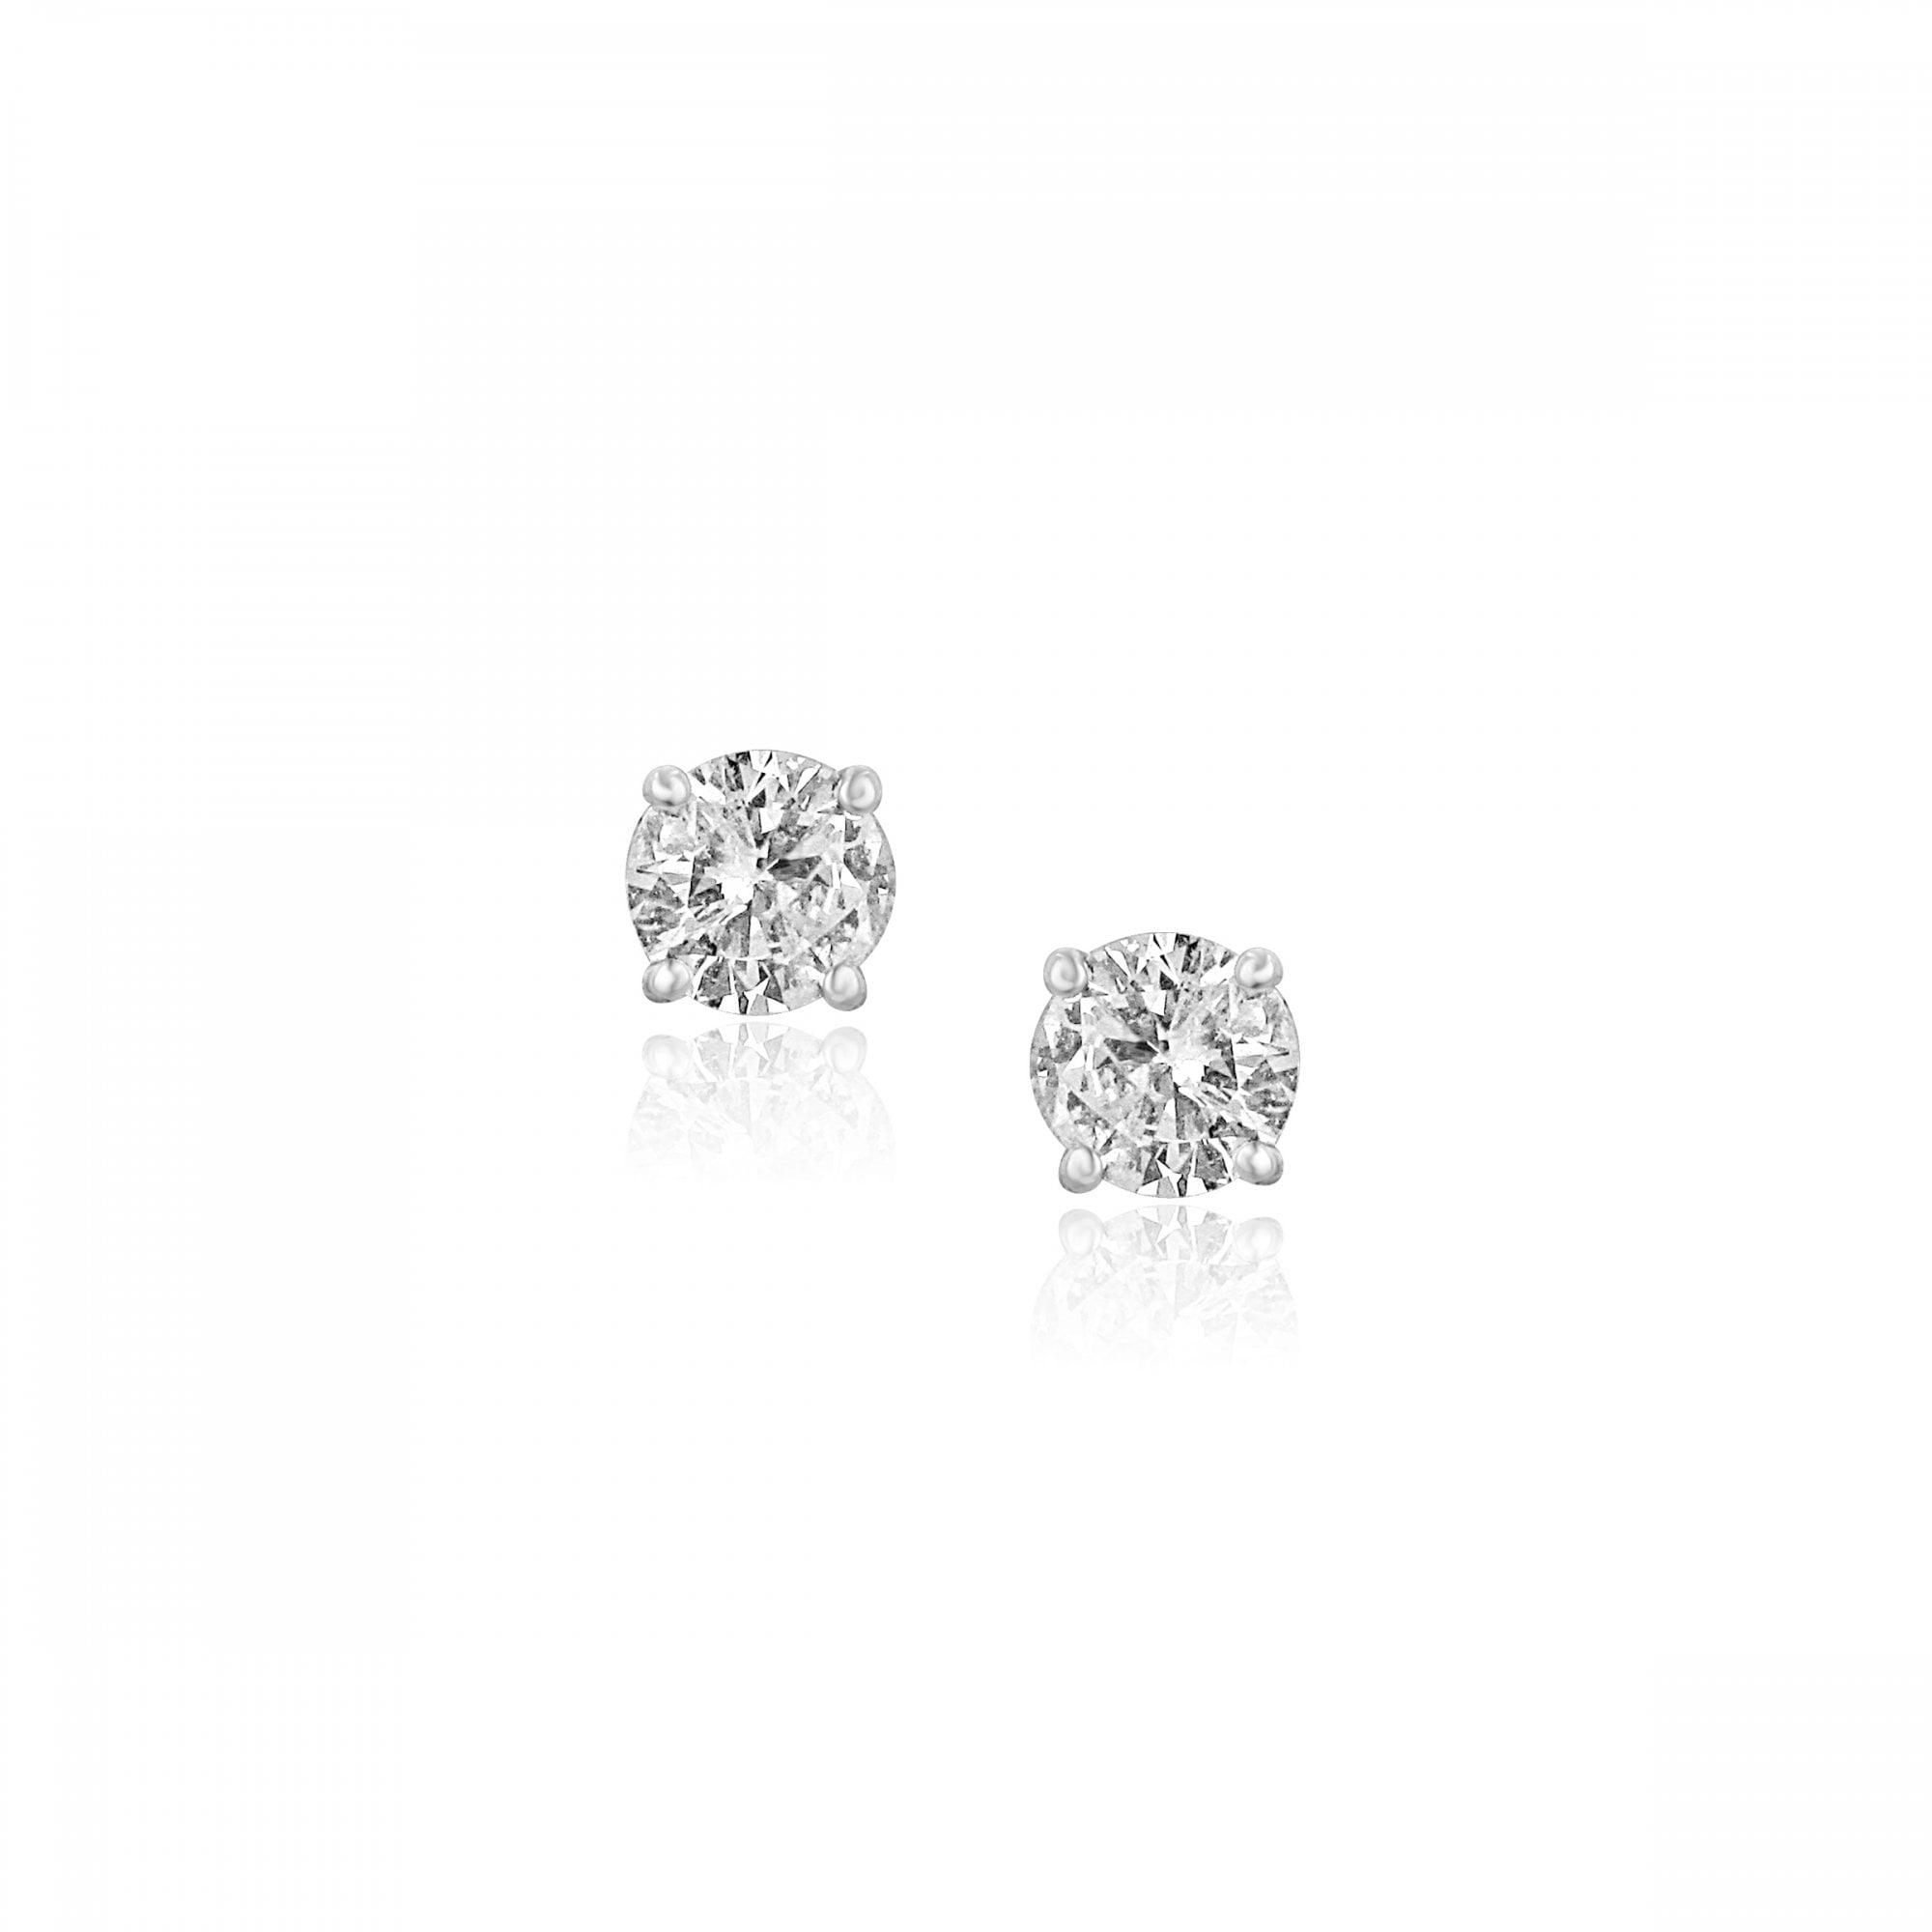 18ct White Gold One Carat Diamond Earrings - Womens from Avanti of  Ashbourne Ltd UK 38f318e59